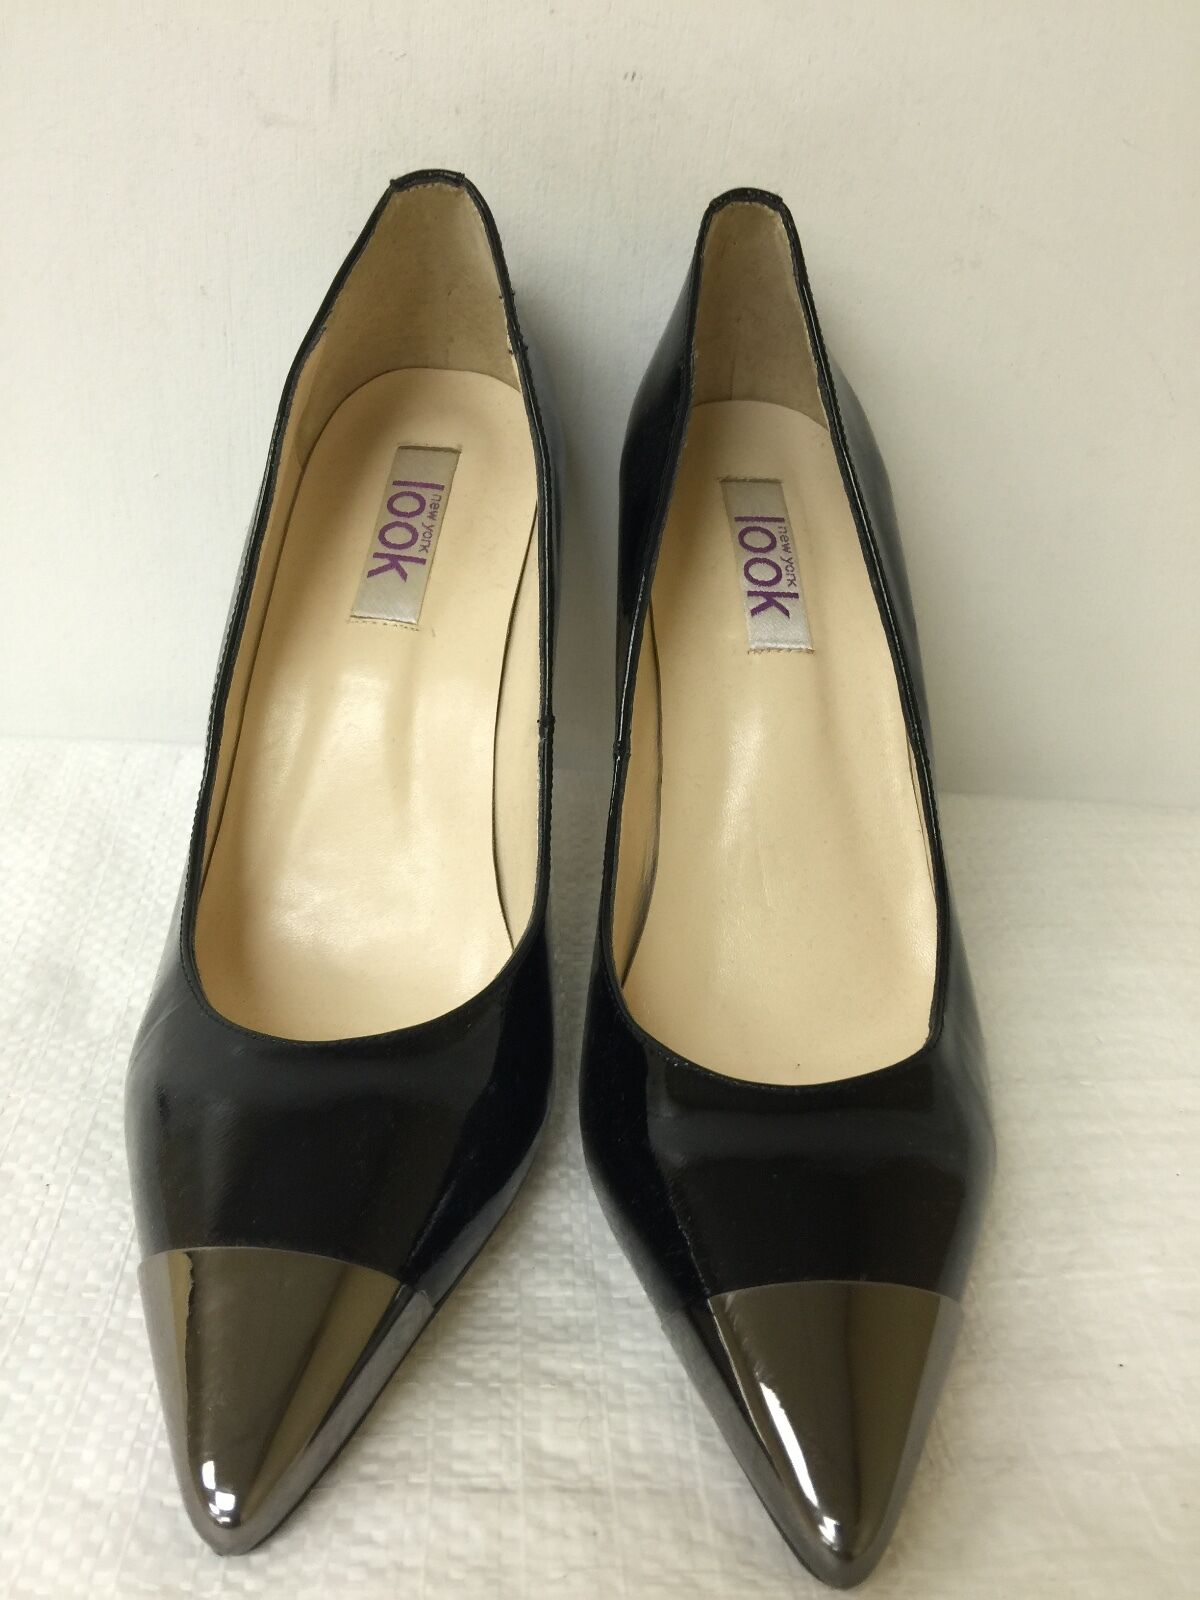 New York Look damen schwarz Silber pump schuhe schuhe schuhe leather Größe 40.5 M pre-owned c36b38